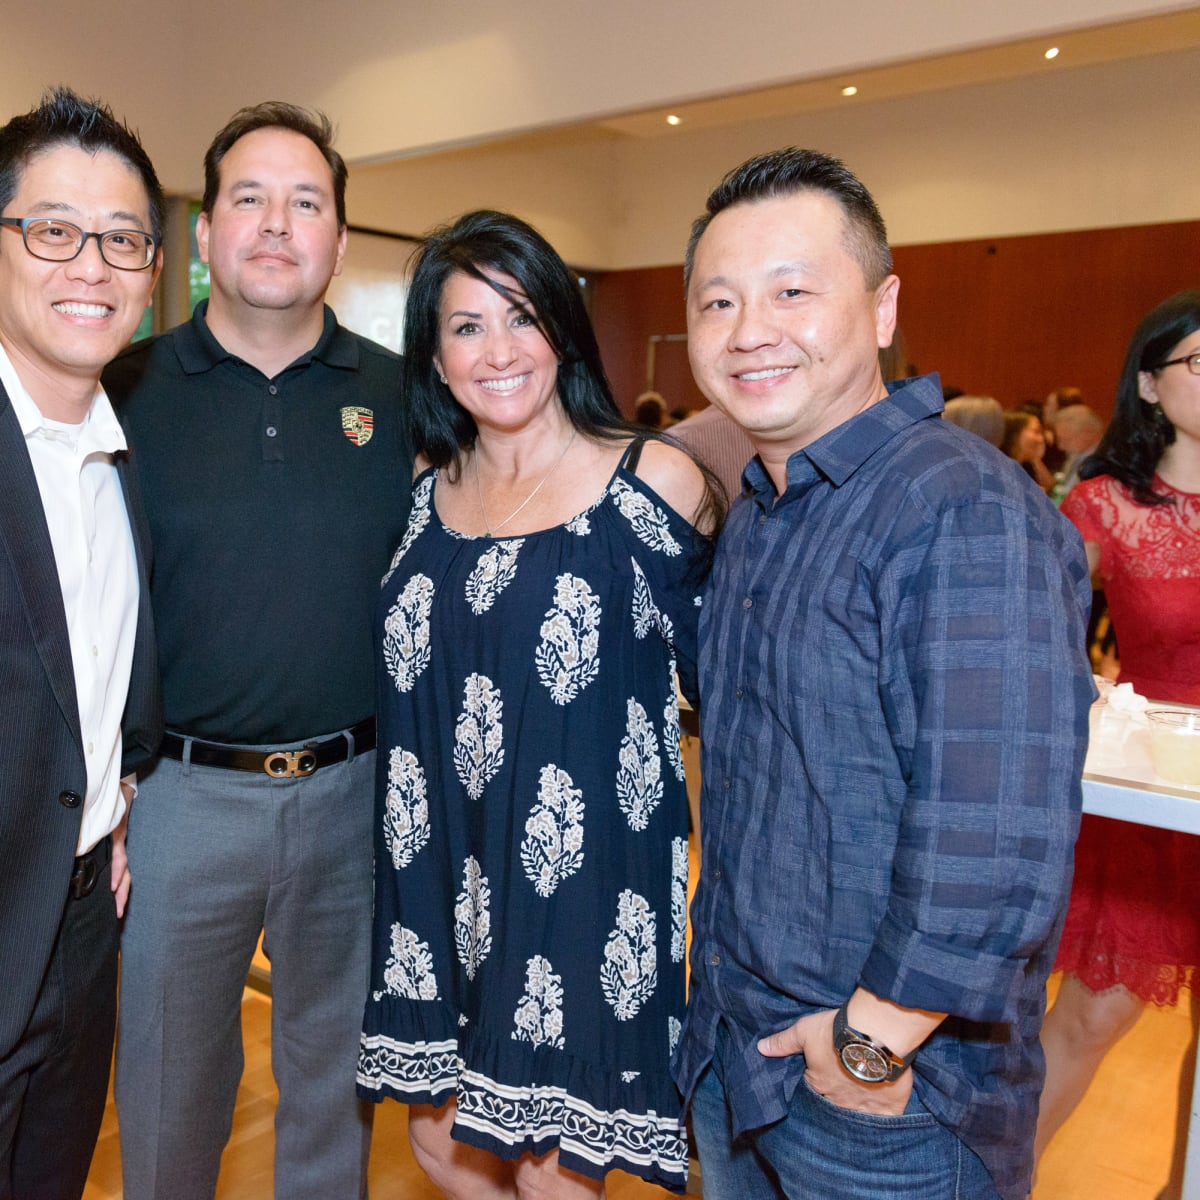 Tastemakers Houston 5/16 Efan Hsu, Jorge Olivas, Michelle Wuerch, Dan Koo